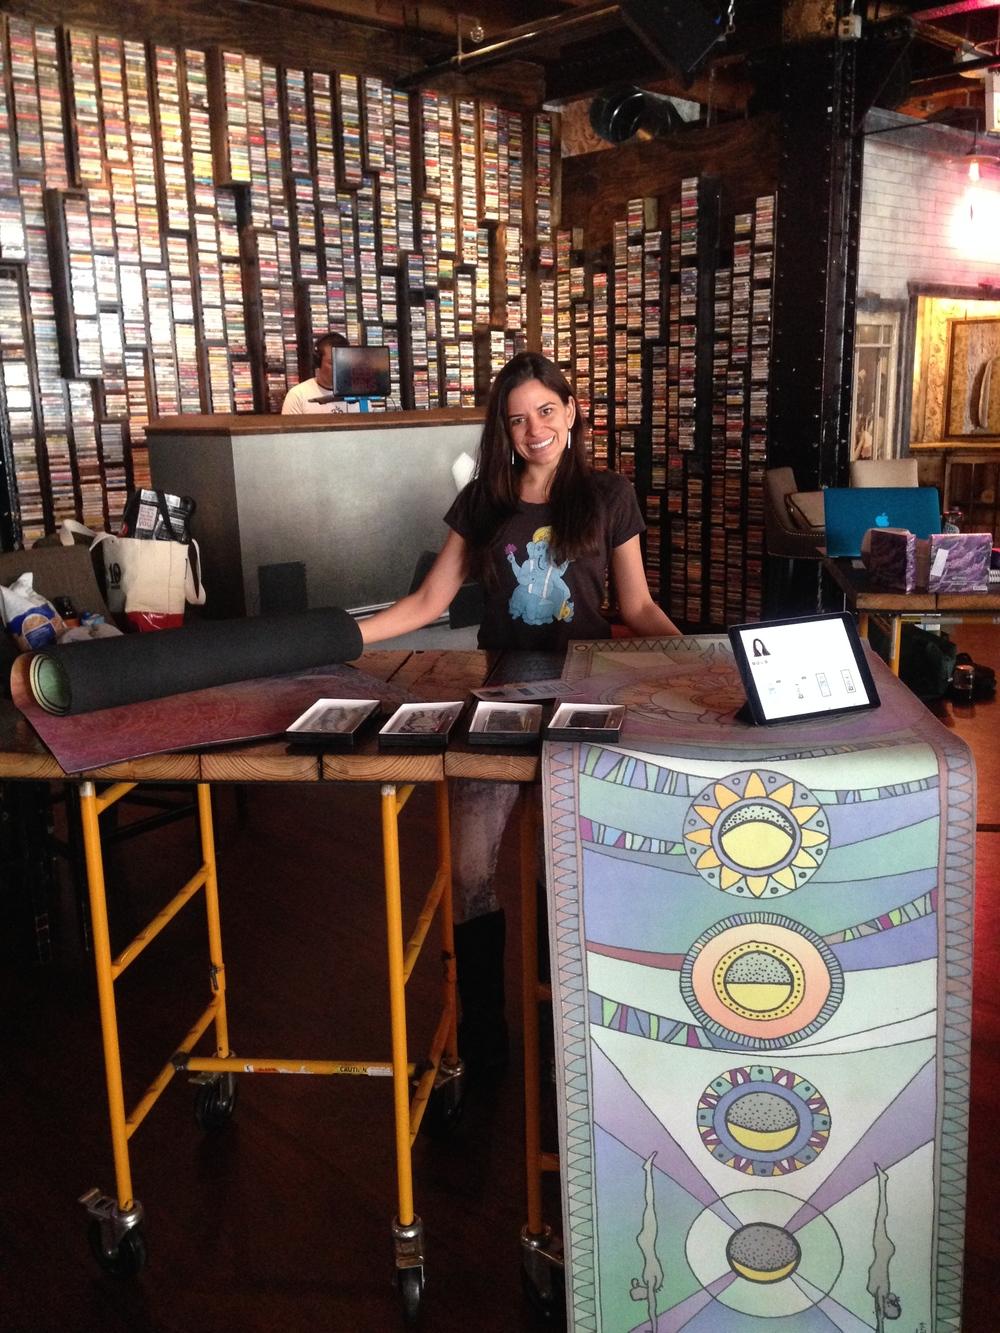 Elyse and Sankalpa Yoga setup shop at Emporium Arcade Bar!